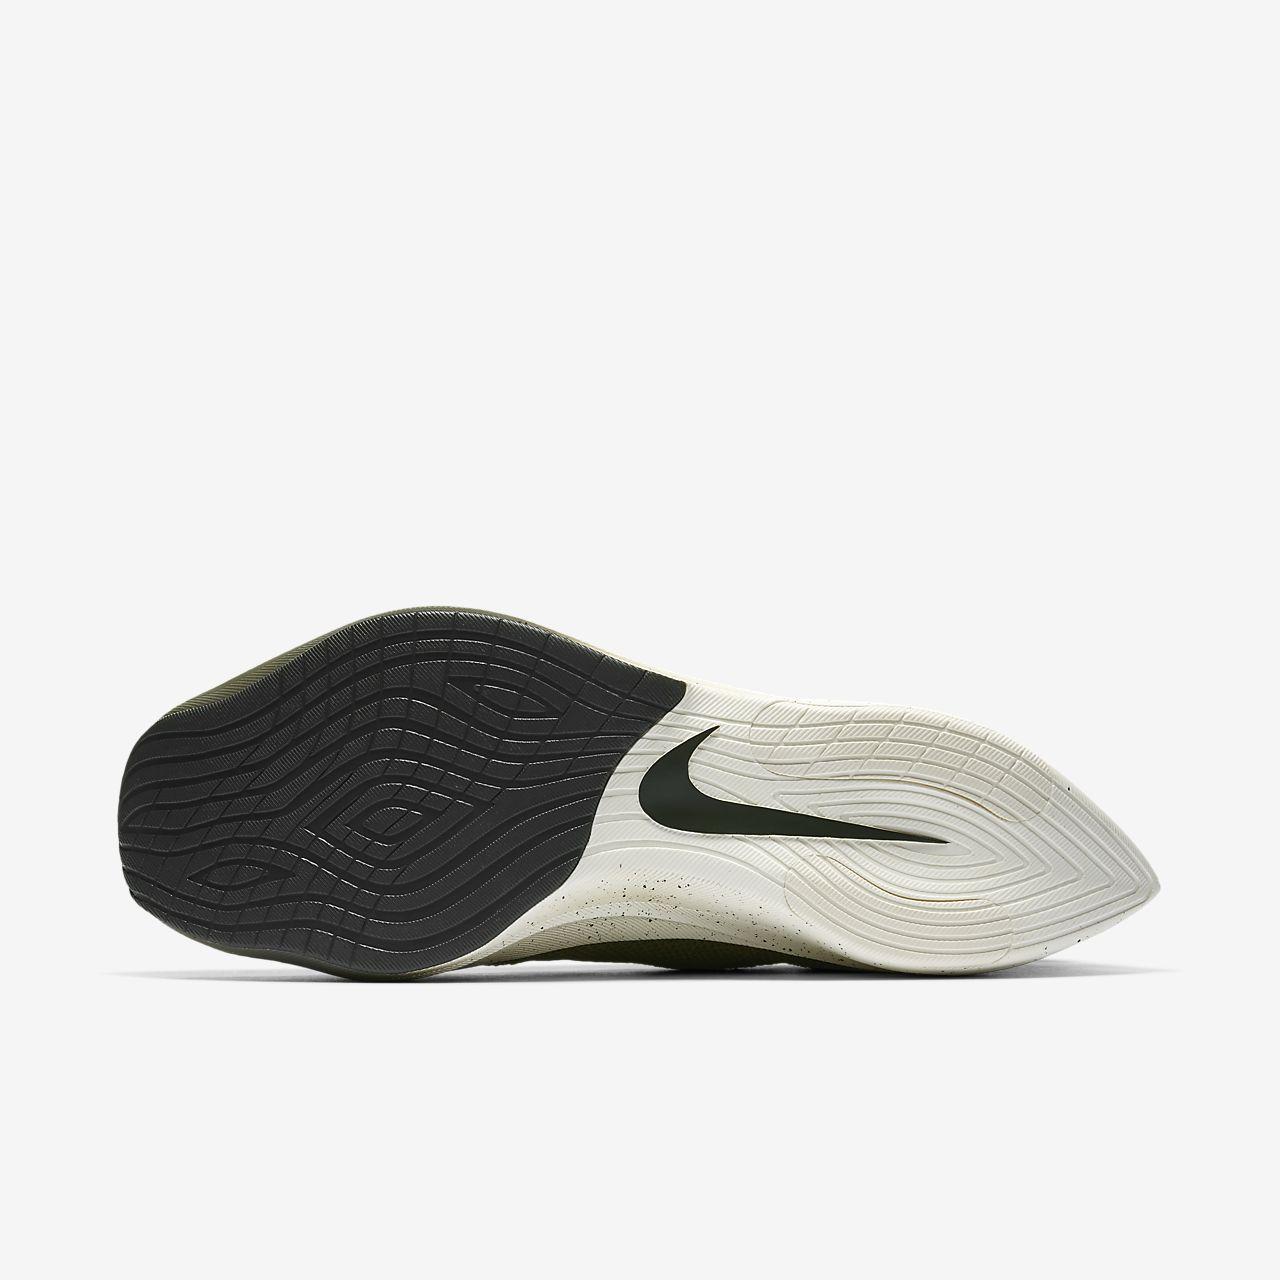 sports shoes 9681b 0e821 Low Resolution Nike React Vapor Street Flyknit Men s Shoe Nike React Vapor  Street Flyknit Men s Shoe